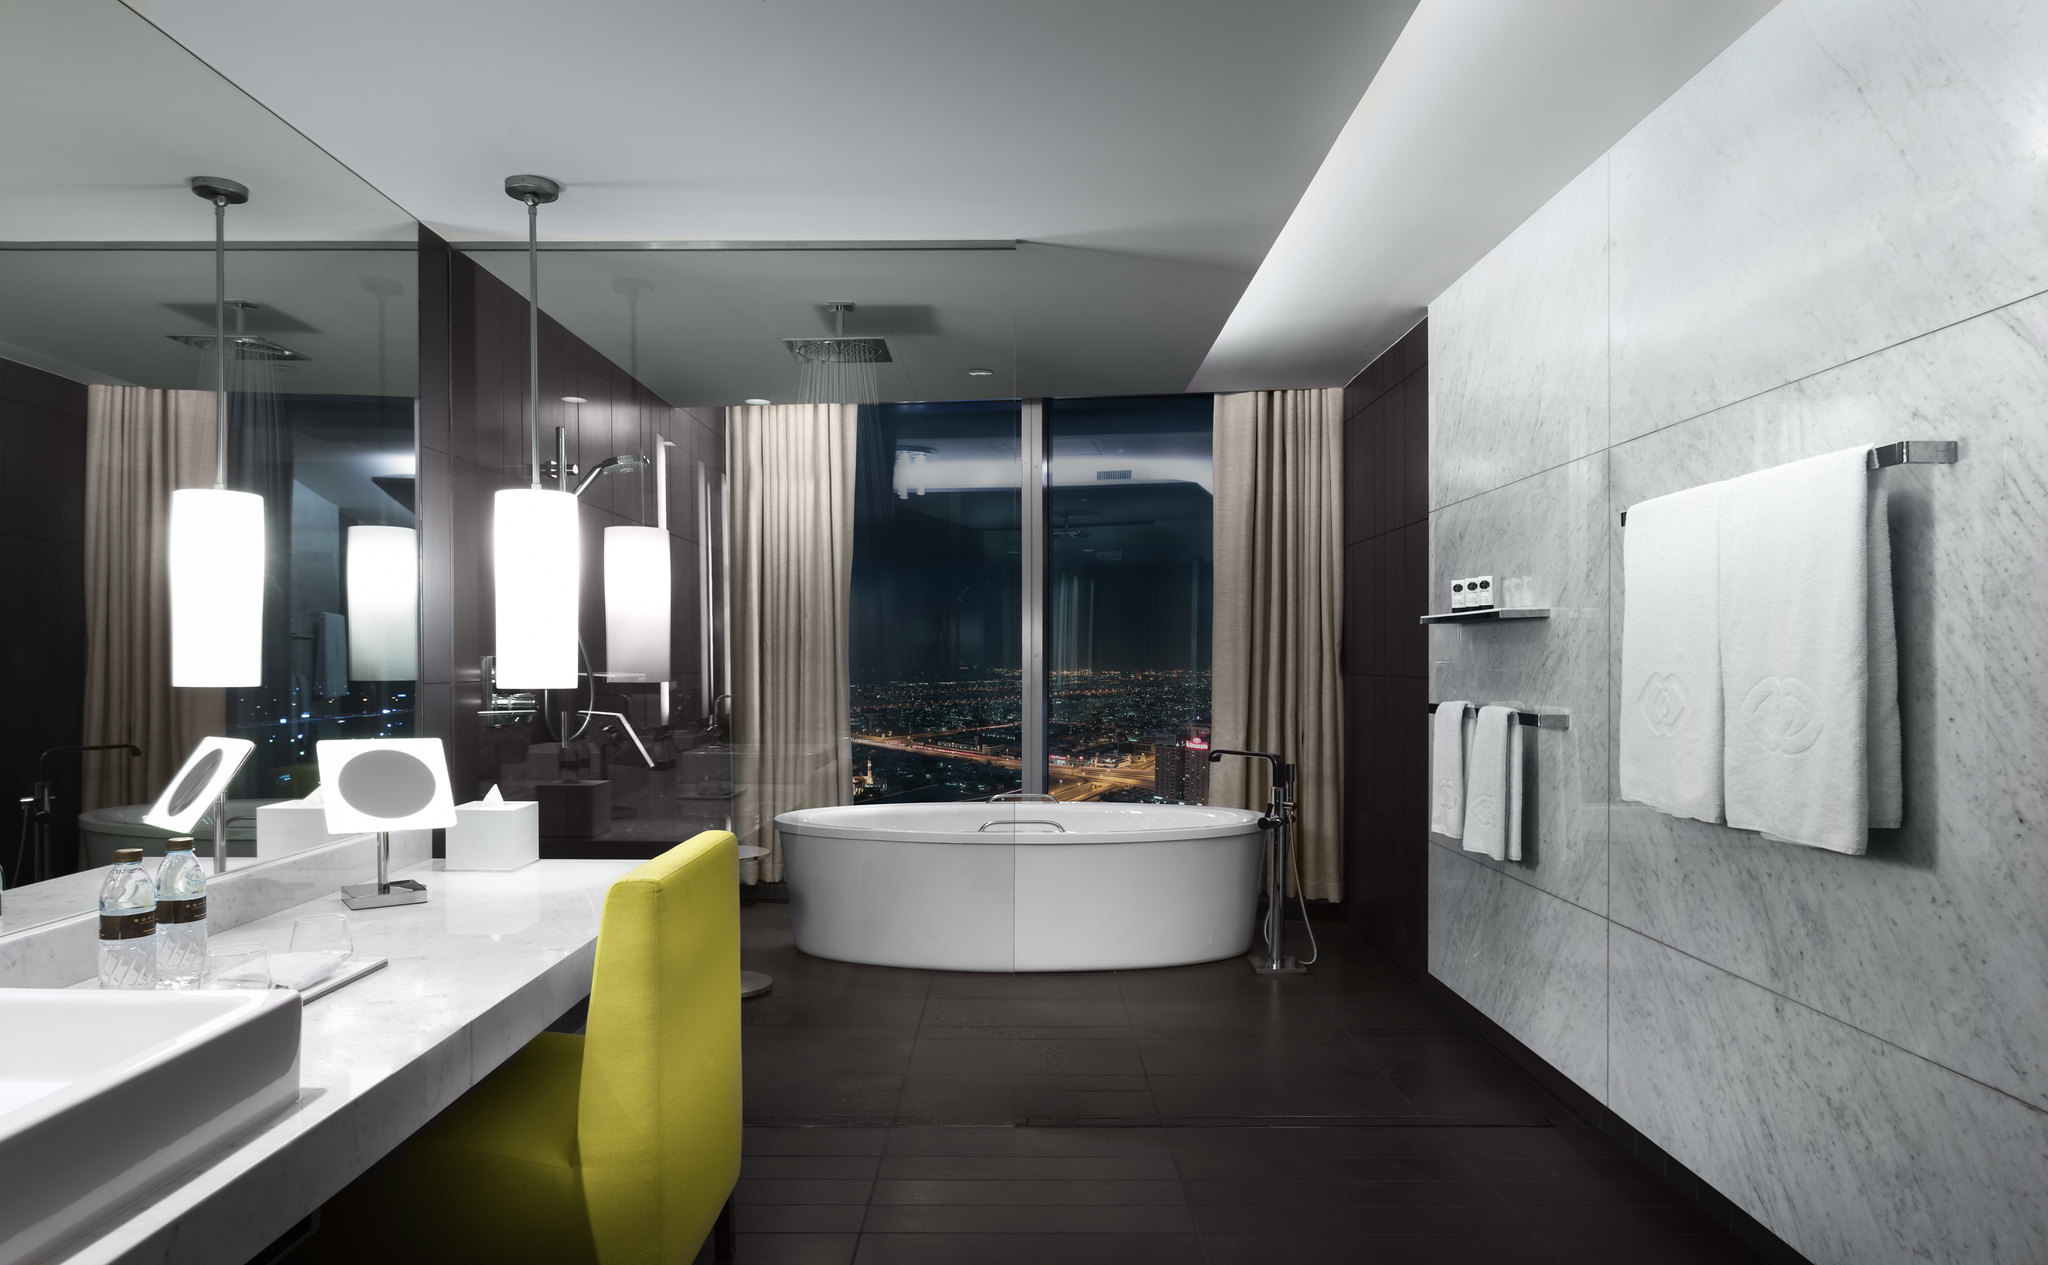 Sofitel Hotel Dubai